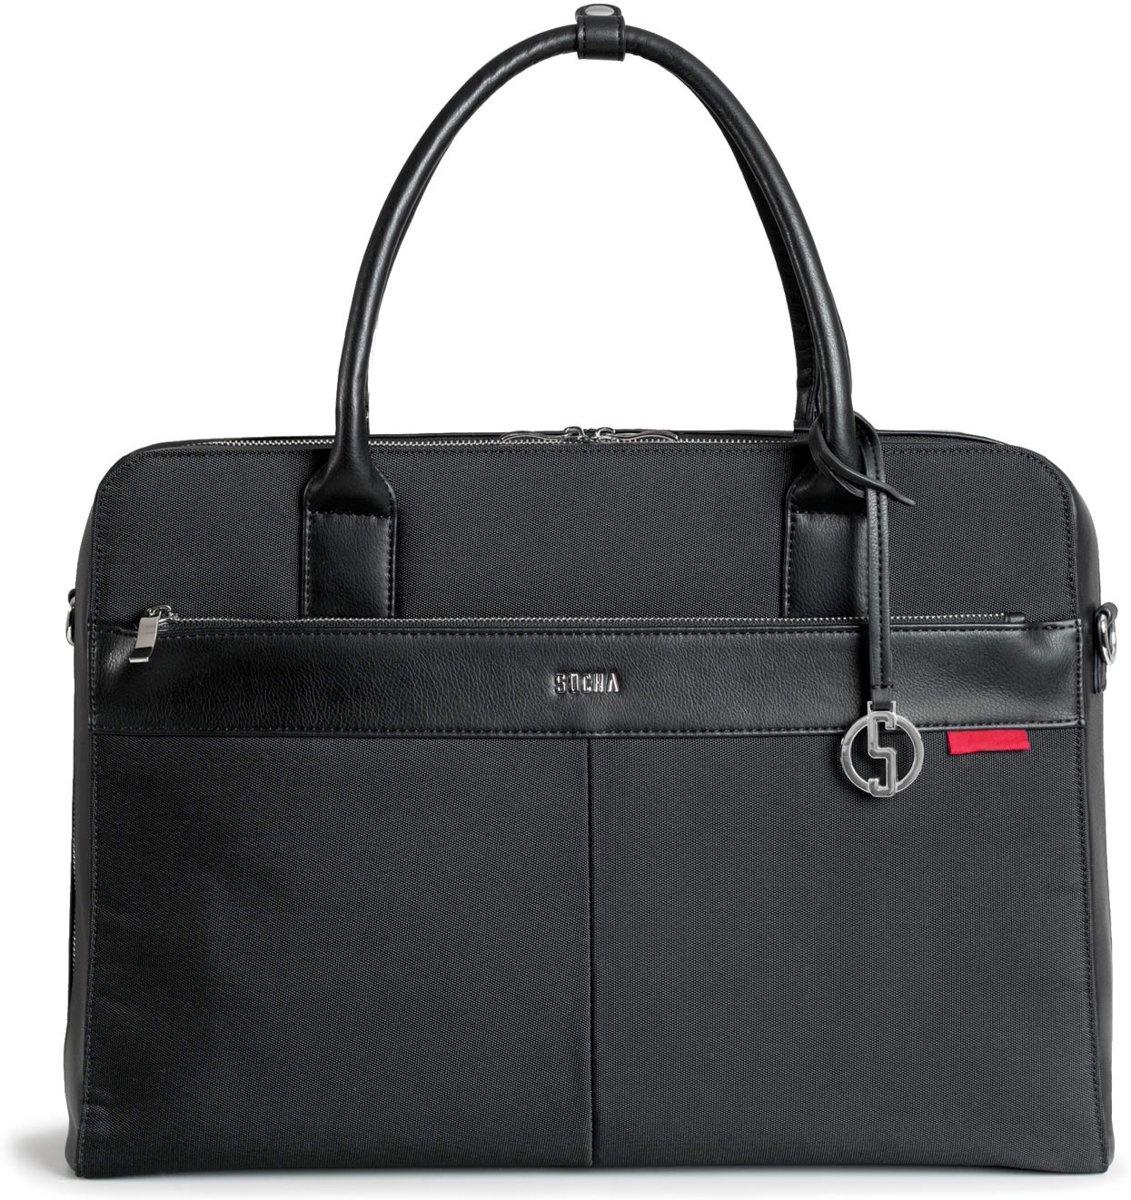 Socha  Socha Business Laptoptas Casual 17.3'' Zwart